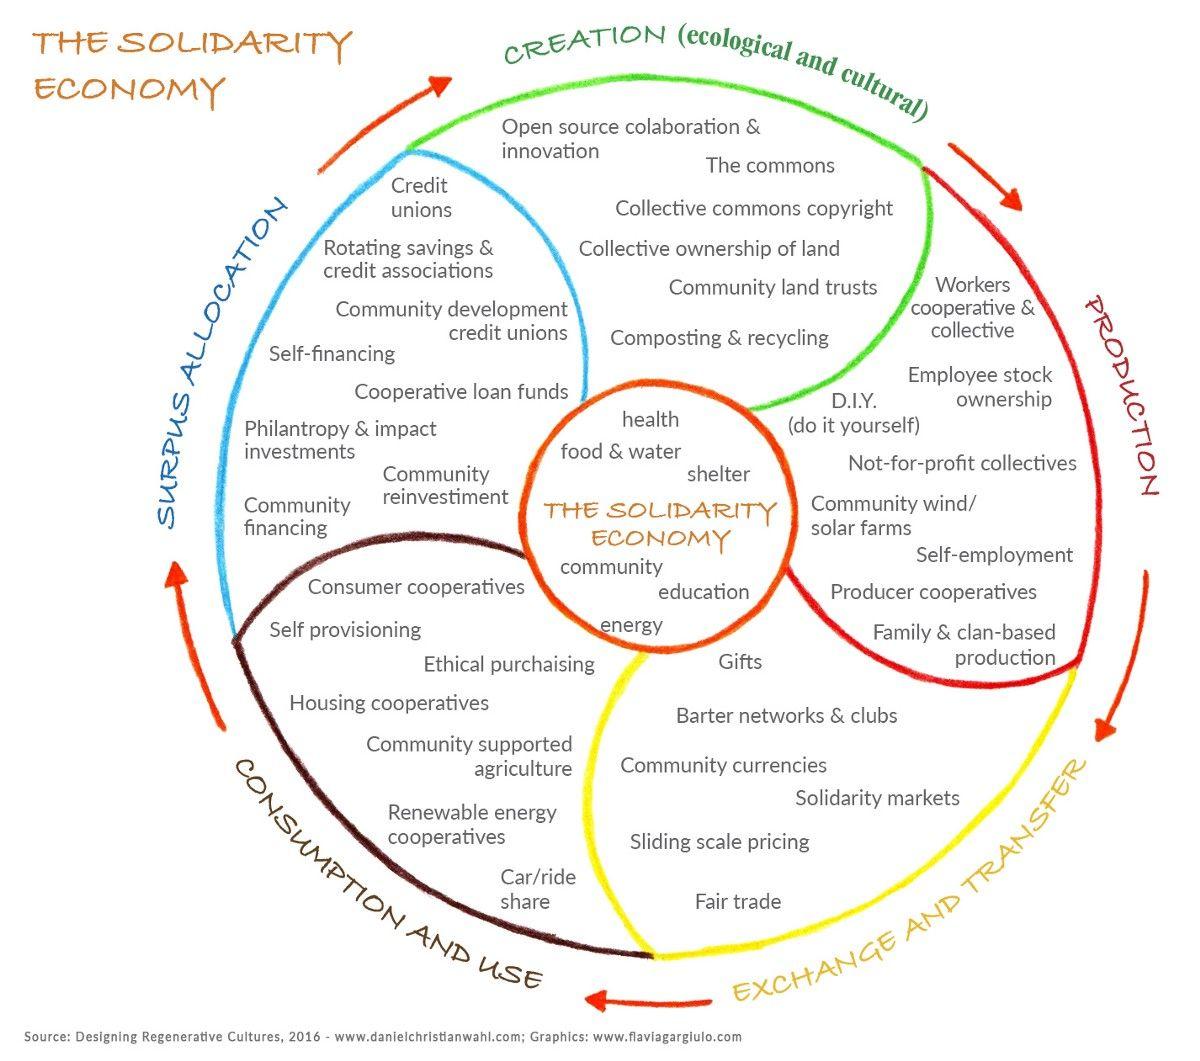 Thriving Communities The Solidarity Economy Economy Community Jobs Community Development